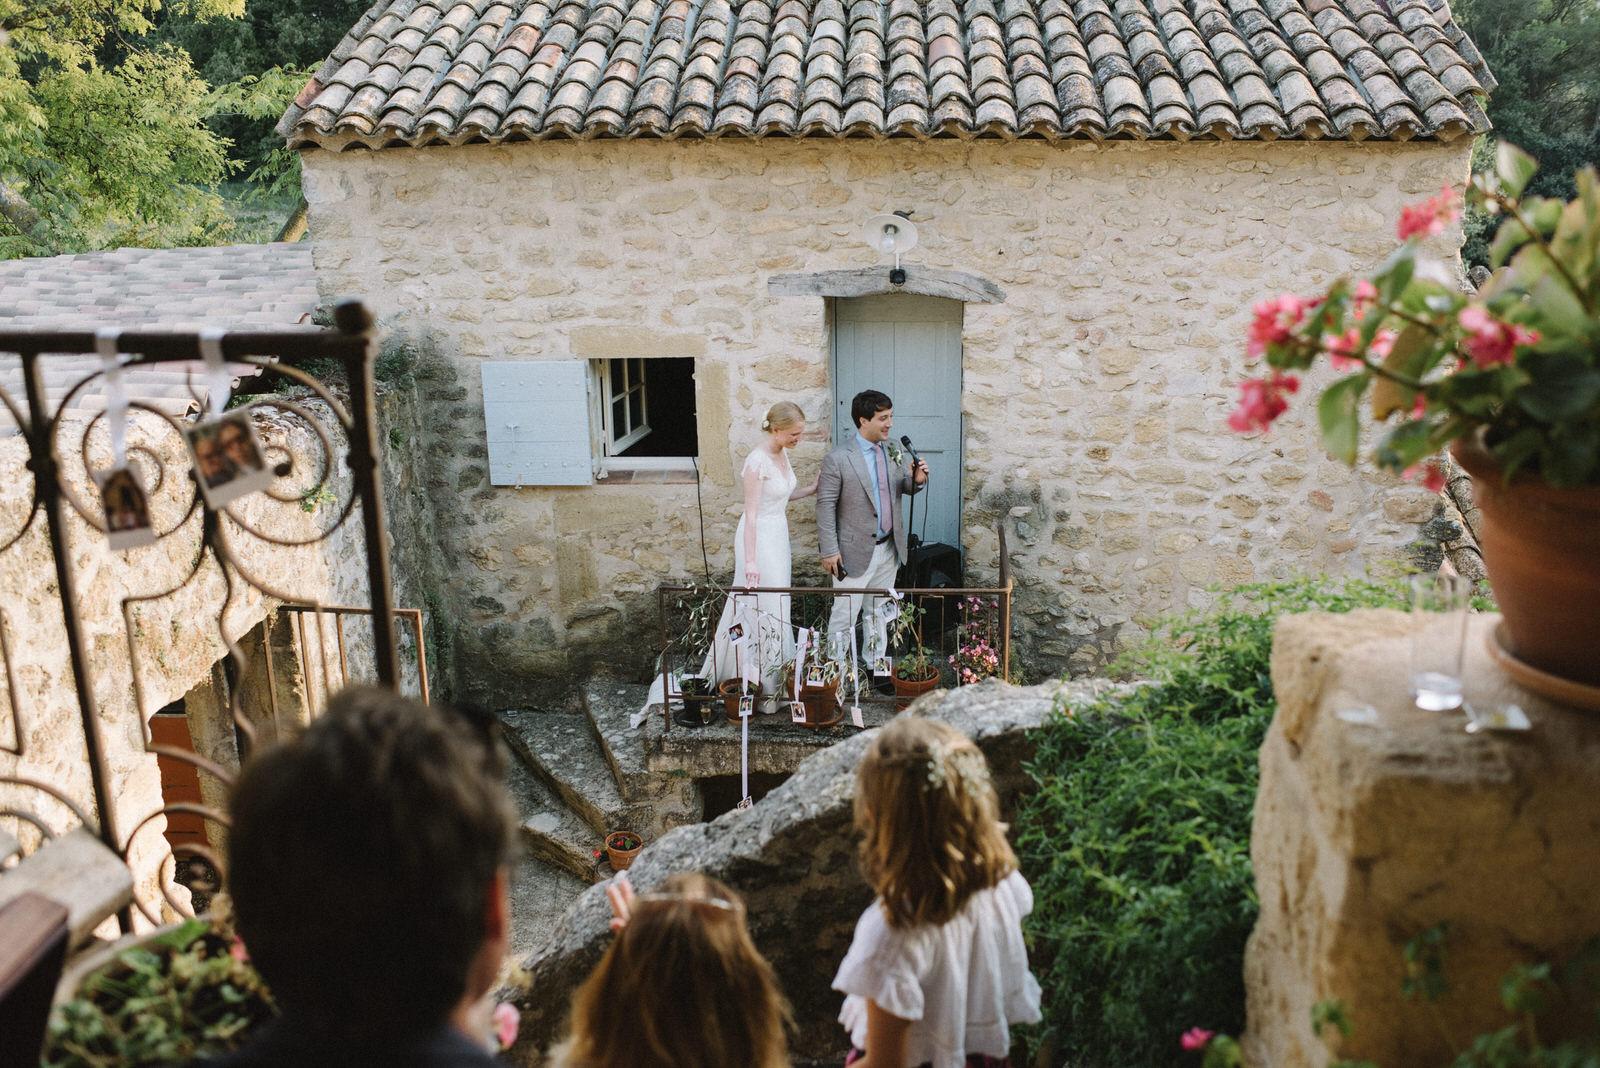 025-LOURMARIN-WEDDING-PHOTOGRAPHER-PROVENCE-WEDDING-ALTERNATIVE-WEDDING-PHOTOGRAPHY-FRANCE-PROVENCE-GARDEN-WEDDING.JPG